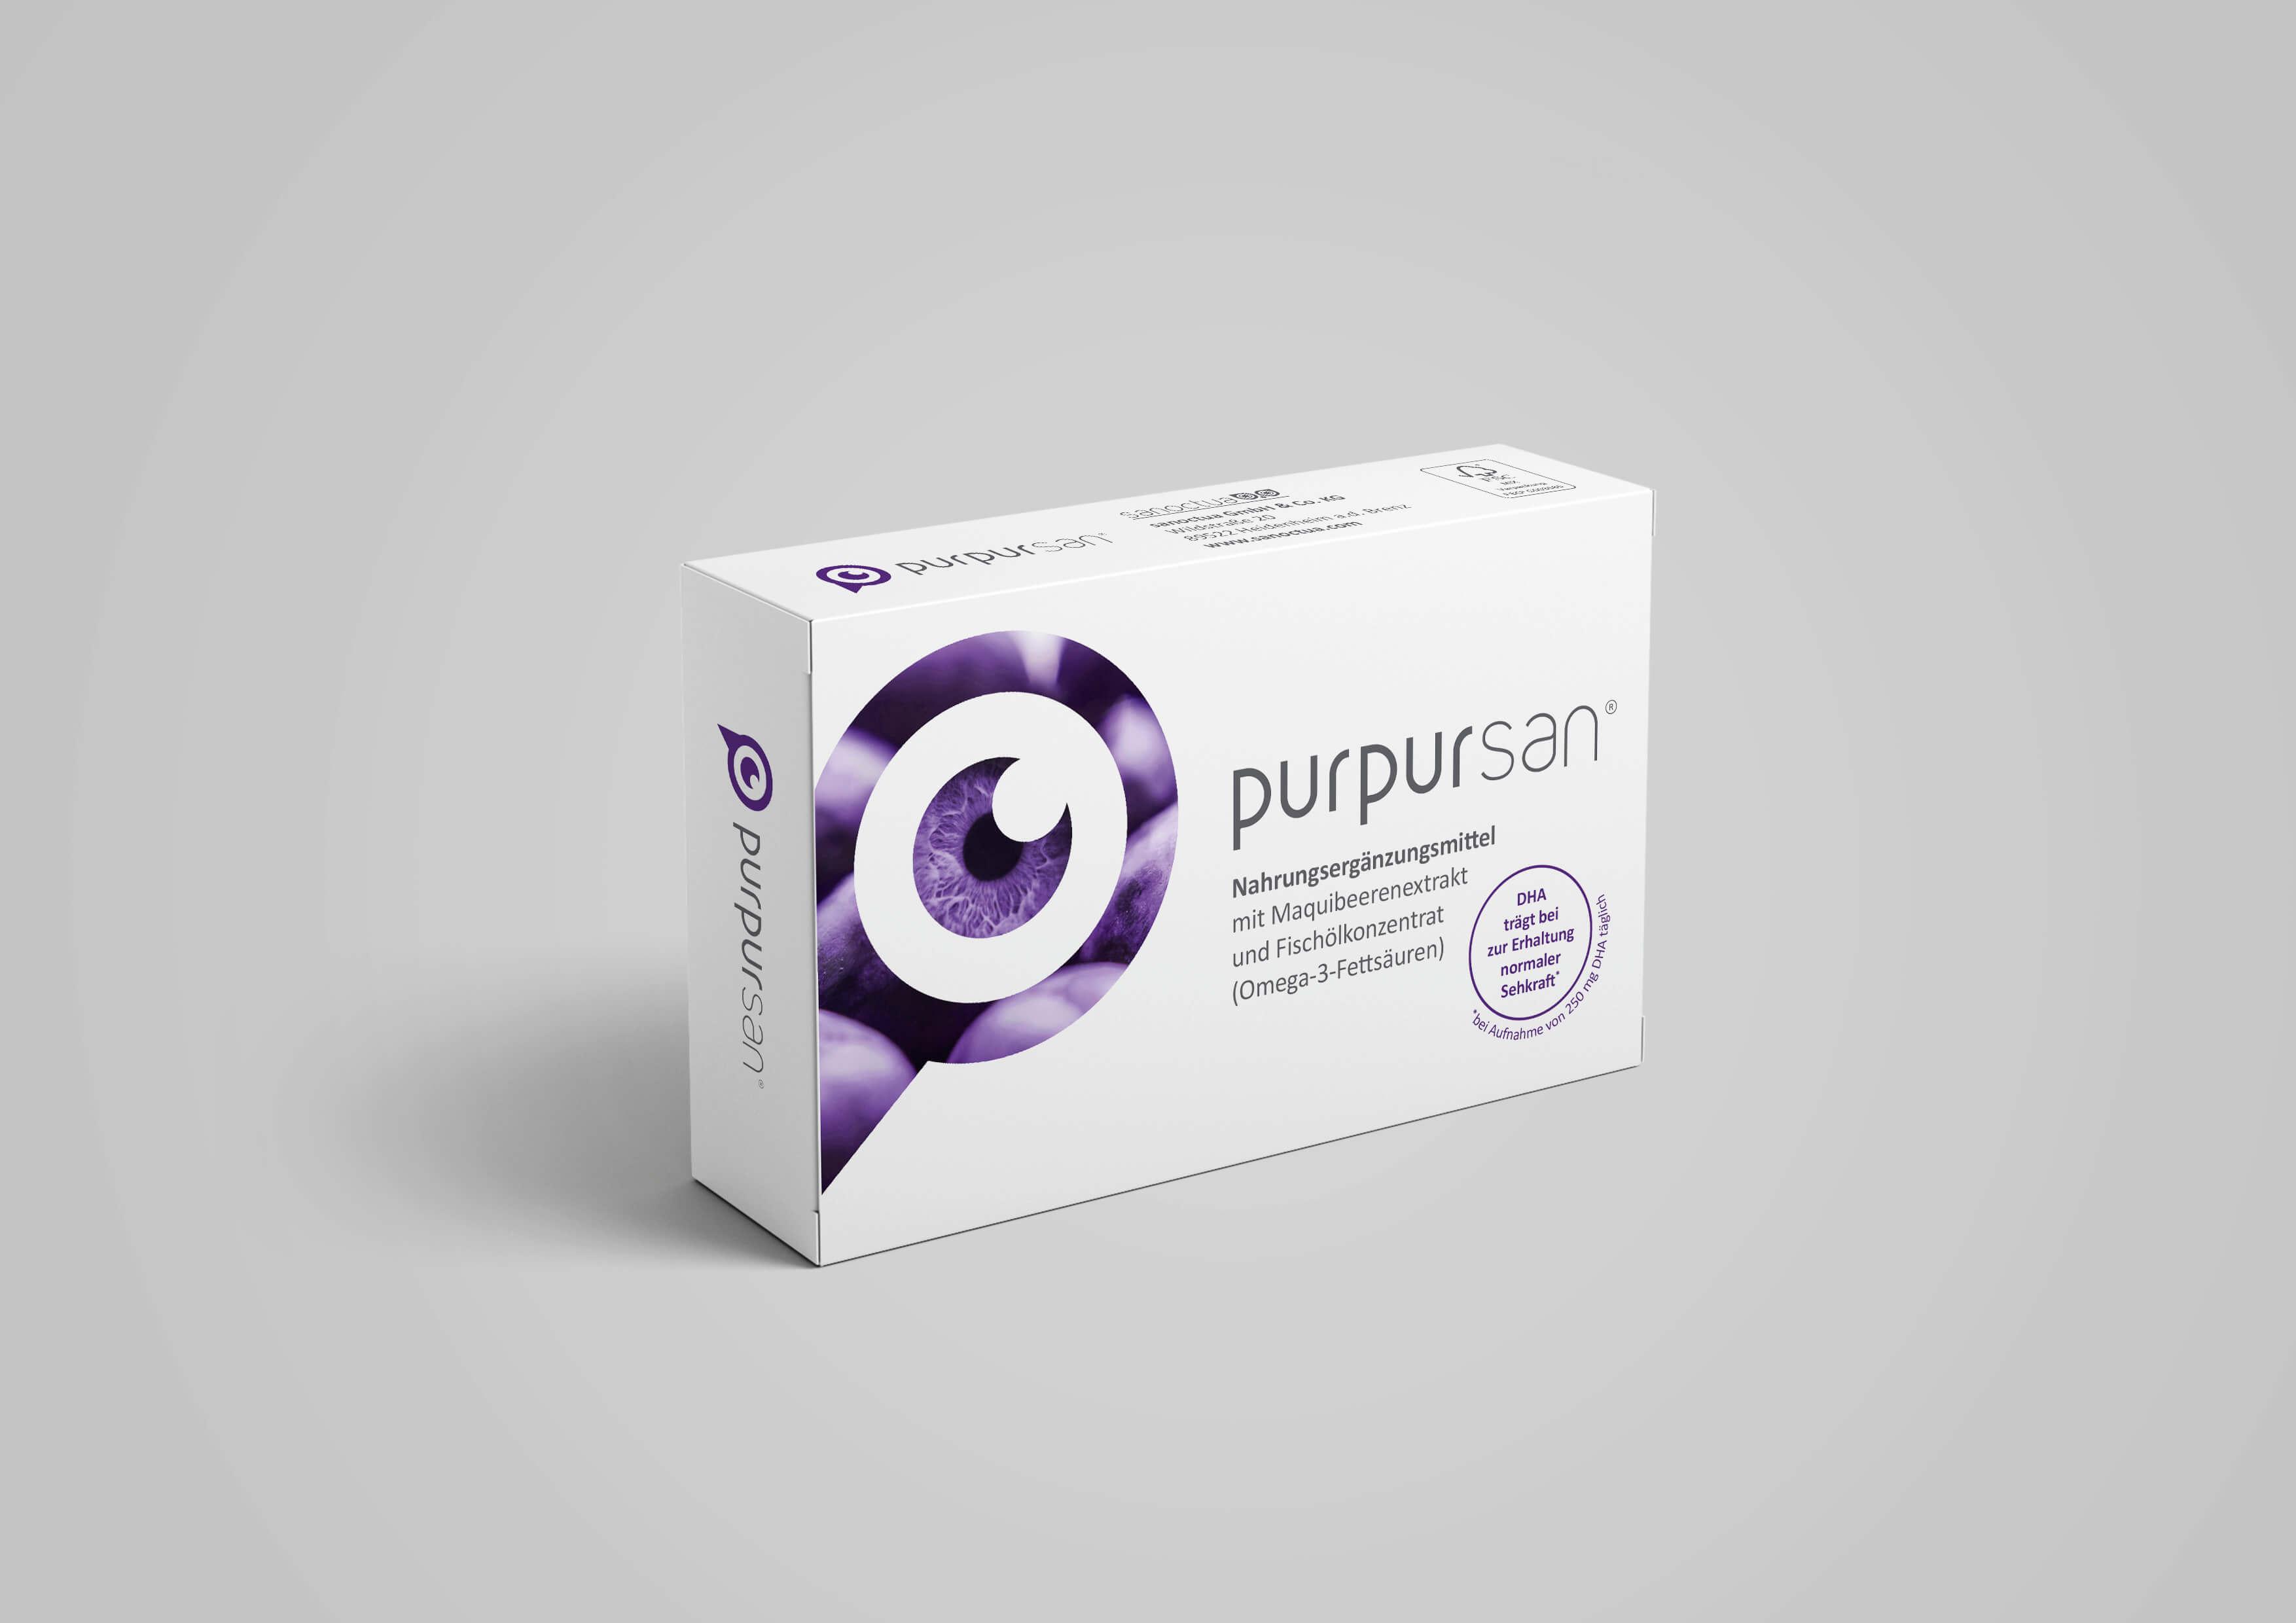 01-sanoctua_purpursan-package_140619(1)